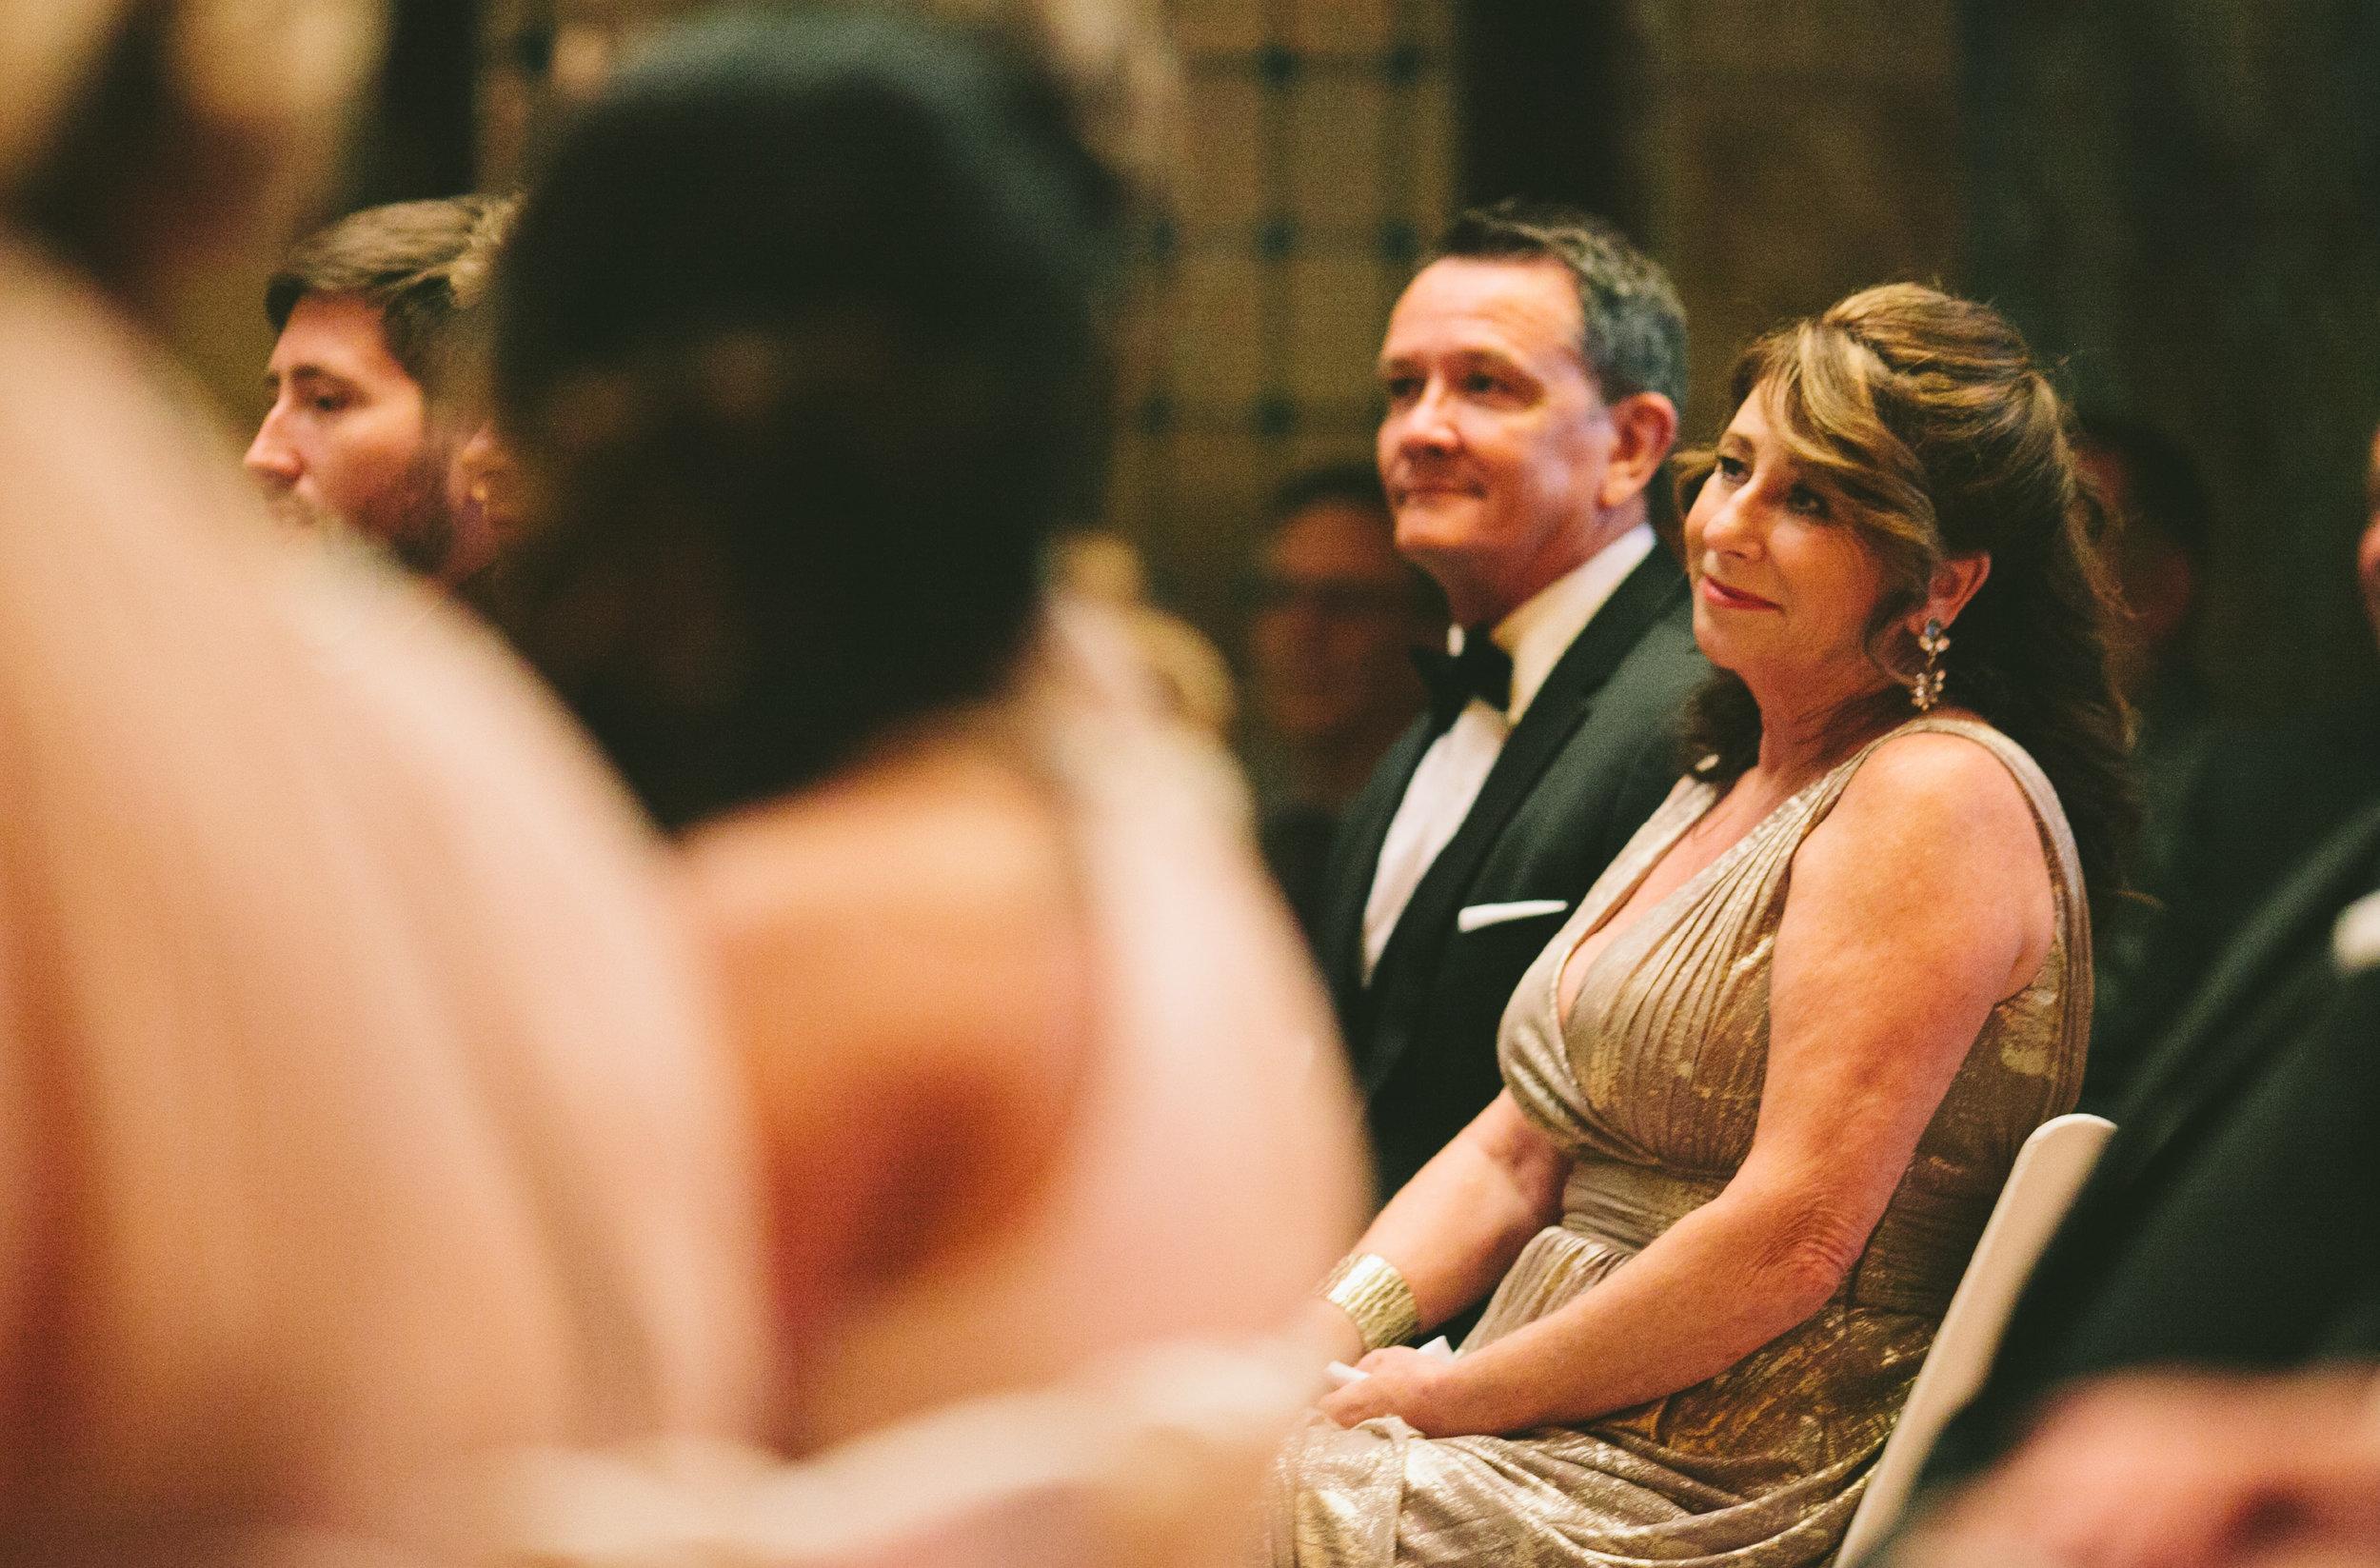 Katie + Dan Wedding at the Cruz Building Miami71.jpg